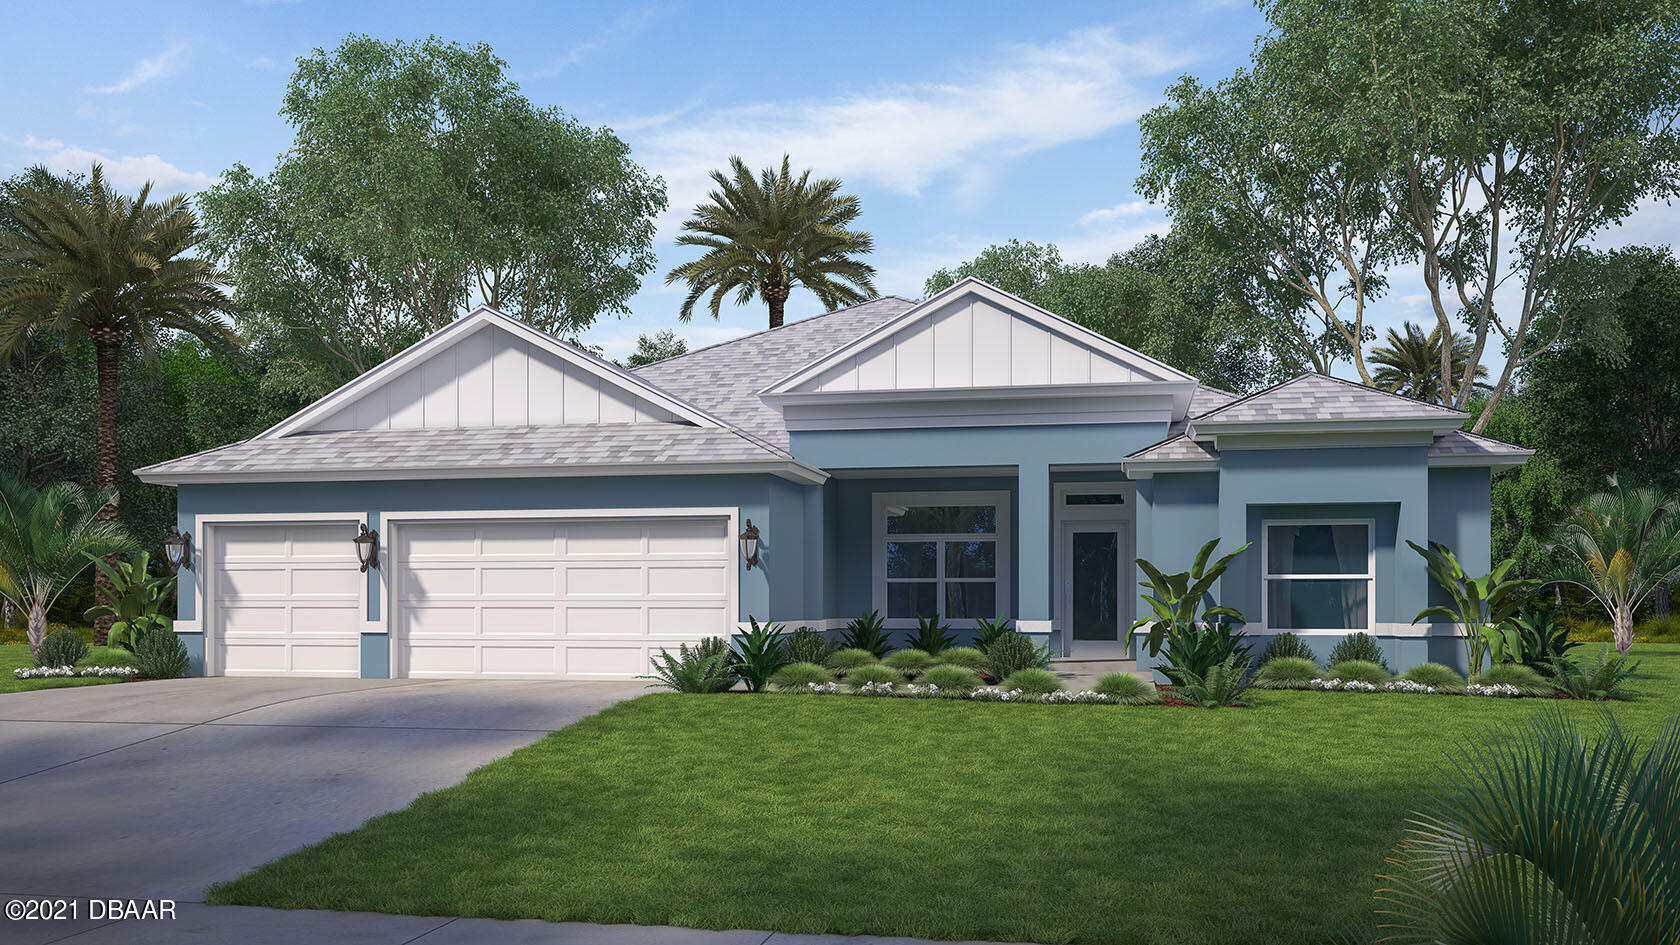 Photo of 3055 Silvermines Avenue, Ormond Beach, FL 32174